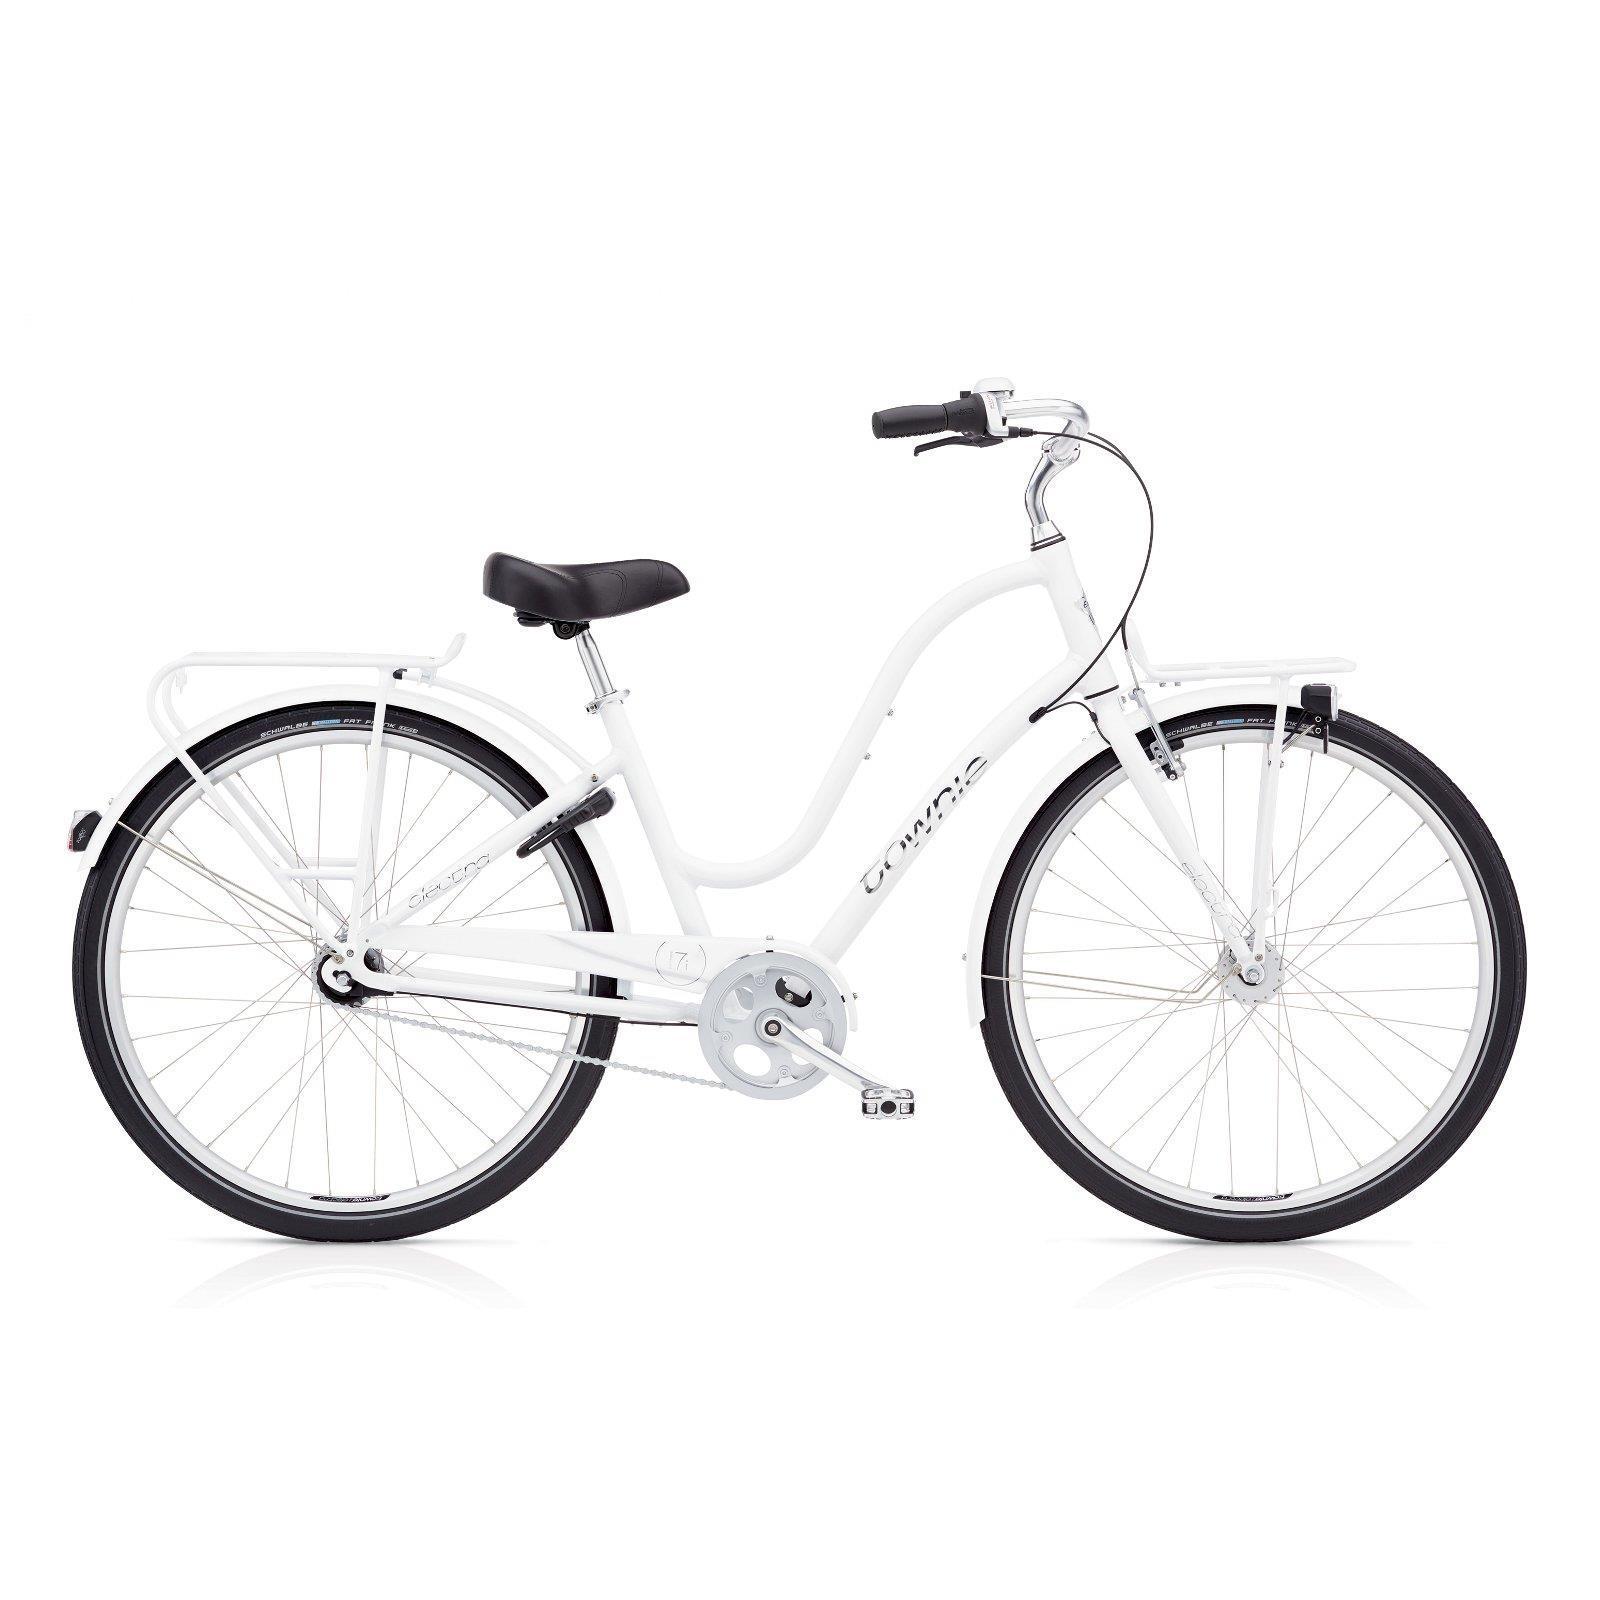 electra townie commute 7i eq damen fahrrad 28 zoll beach cruiser rad beleuchtung ebay. Black Bedroom Furniture Sets. Home Design Ideas